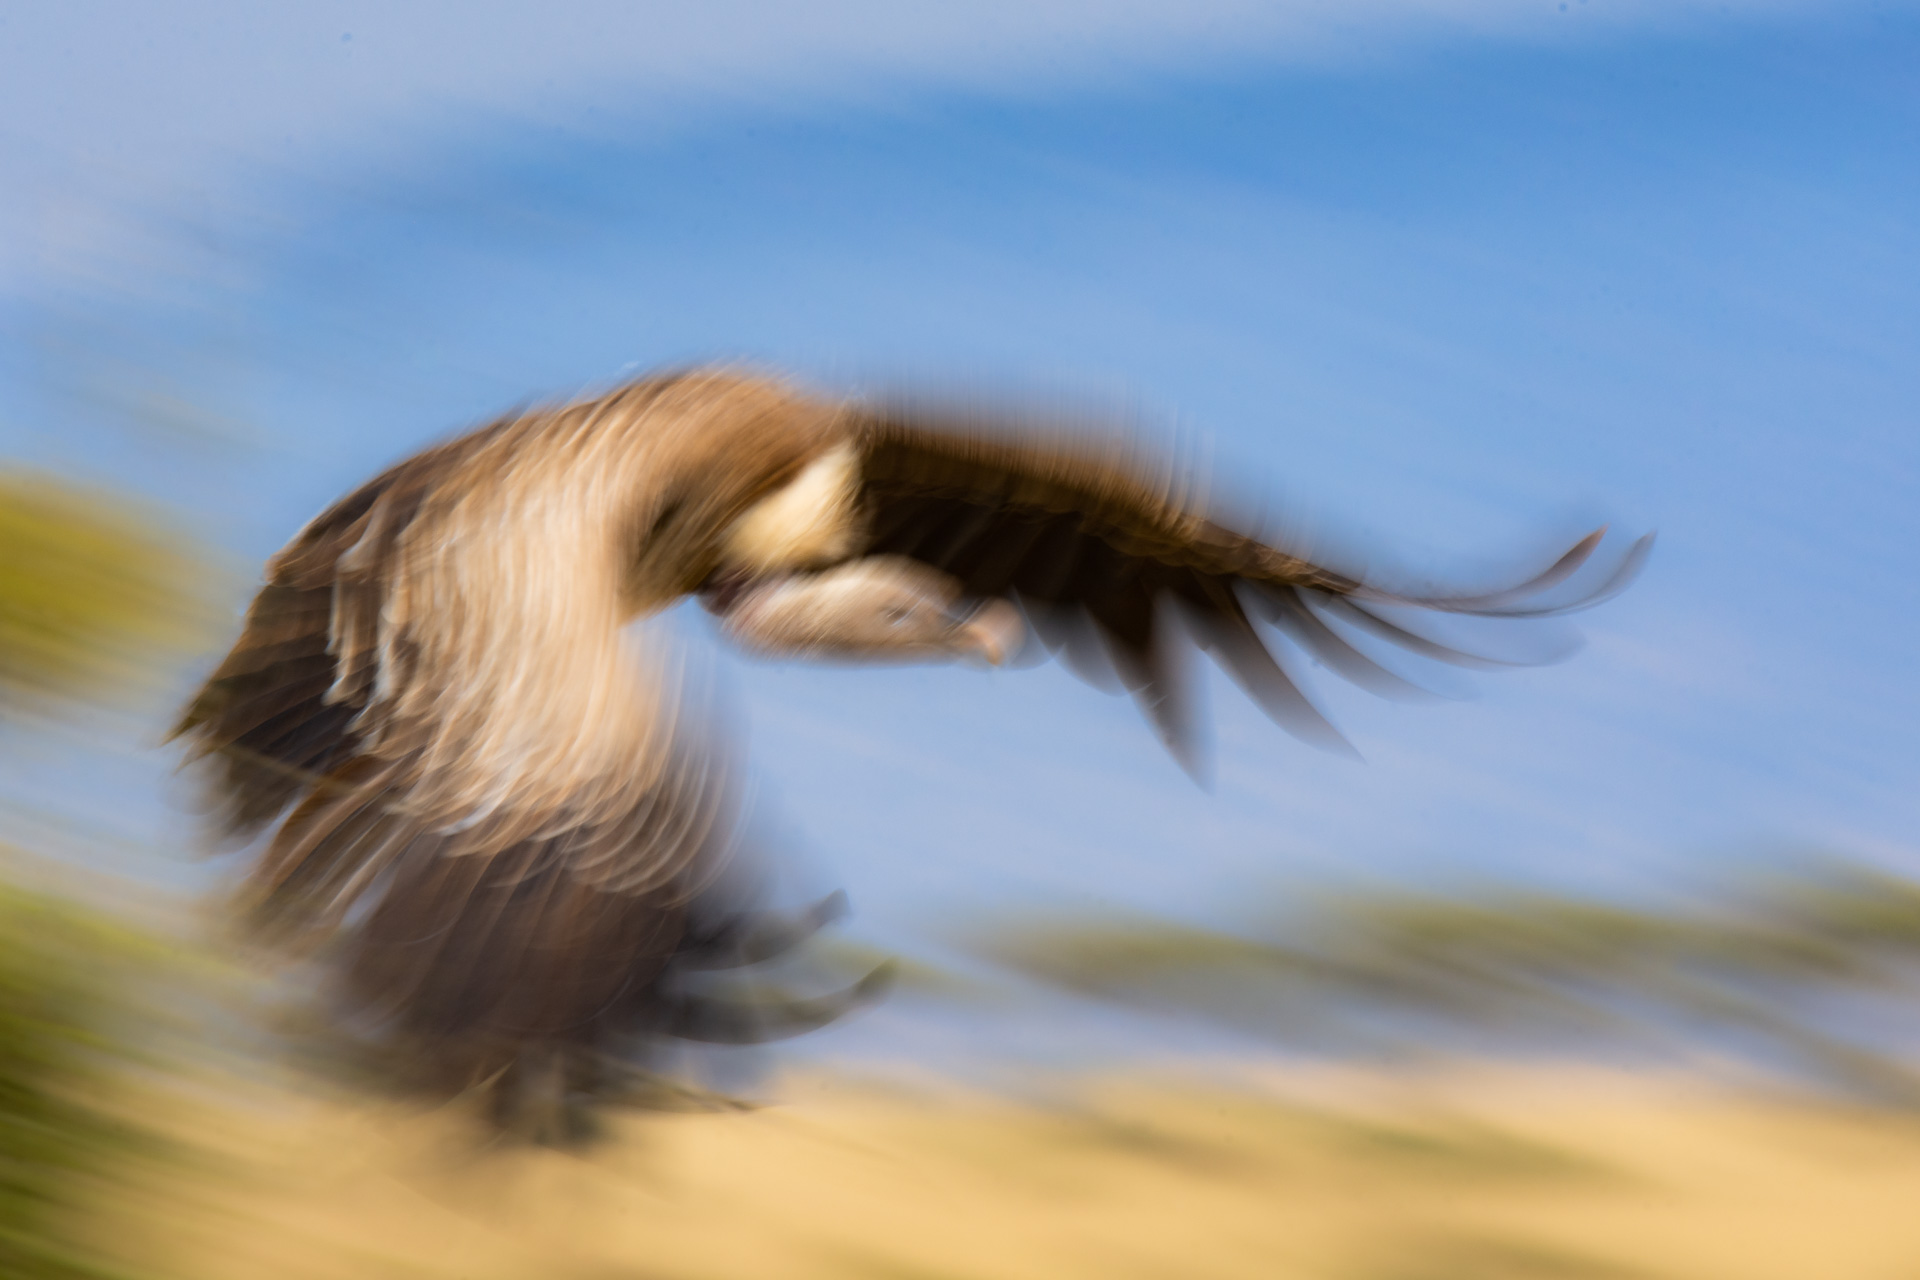 Vulture in flight blur